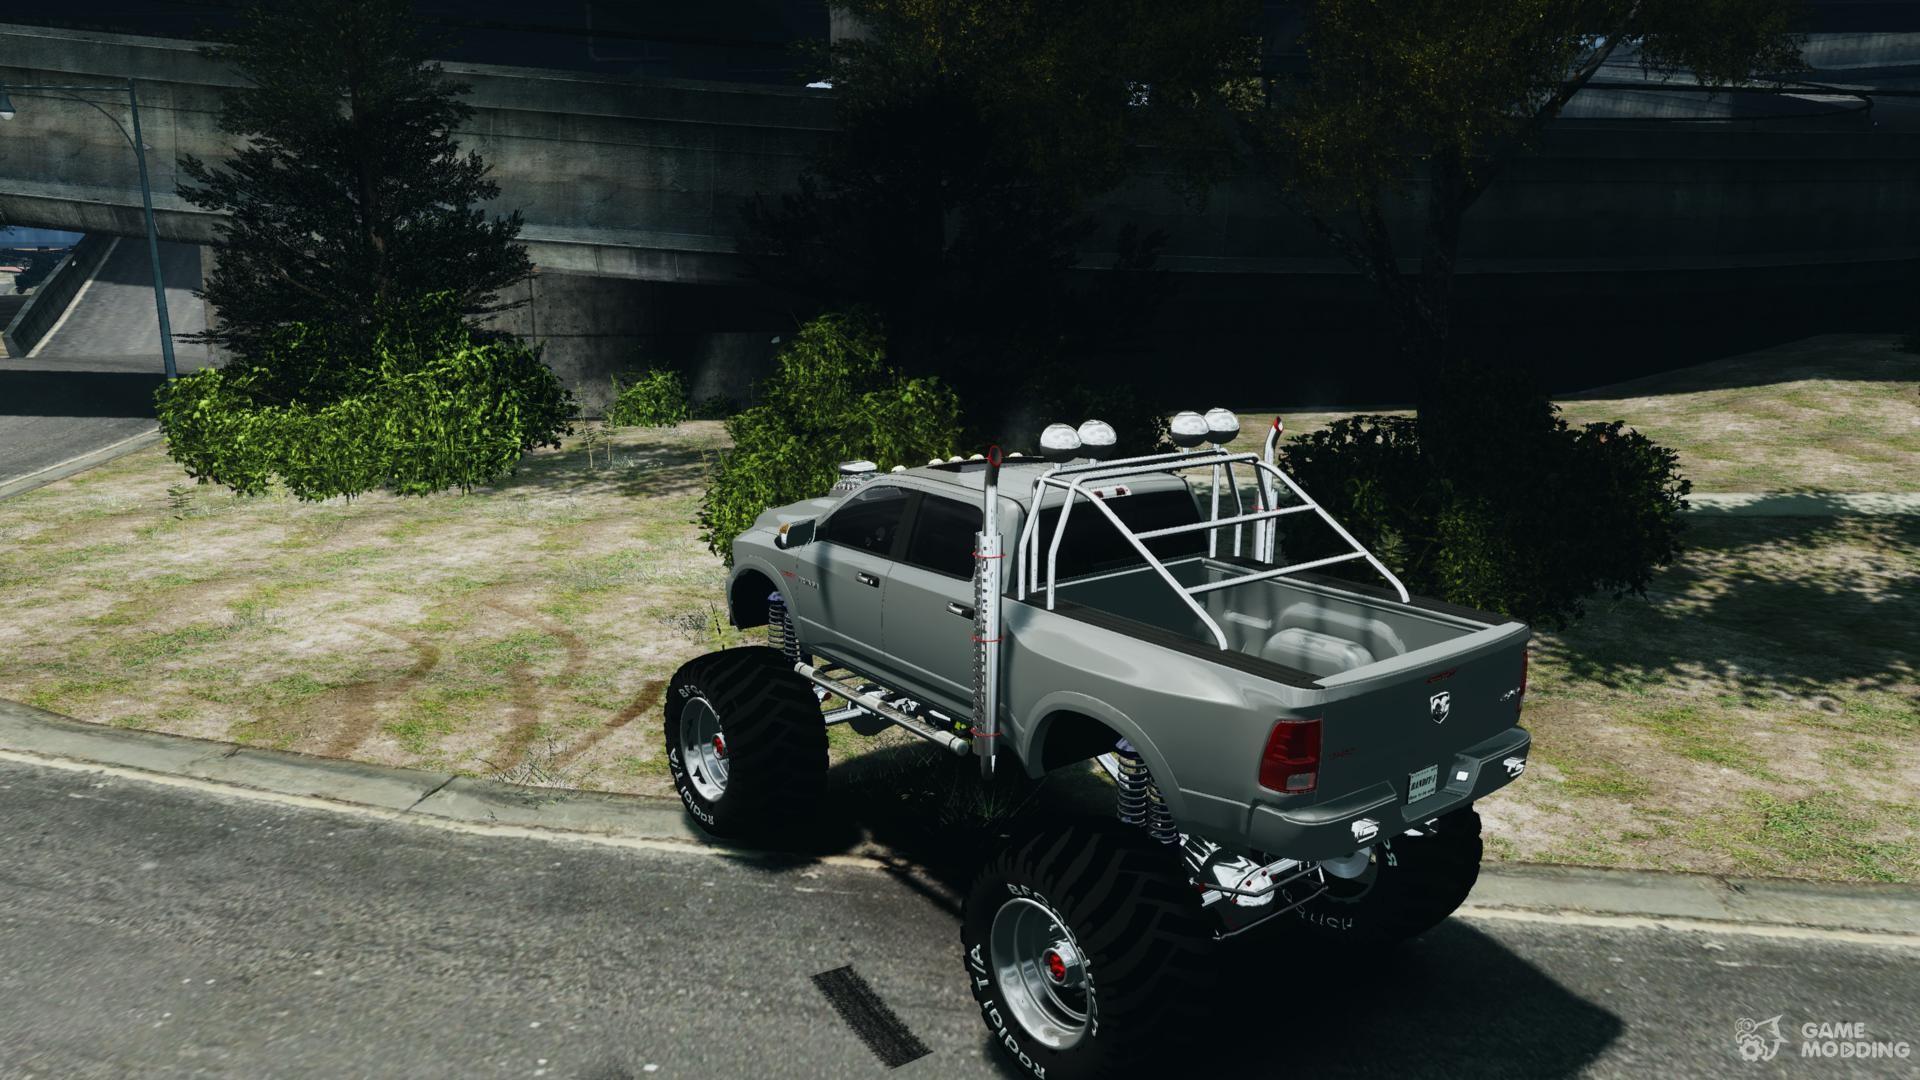 Gta V Lifted Trucks | www.pixshark.com - Images Galleries ...